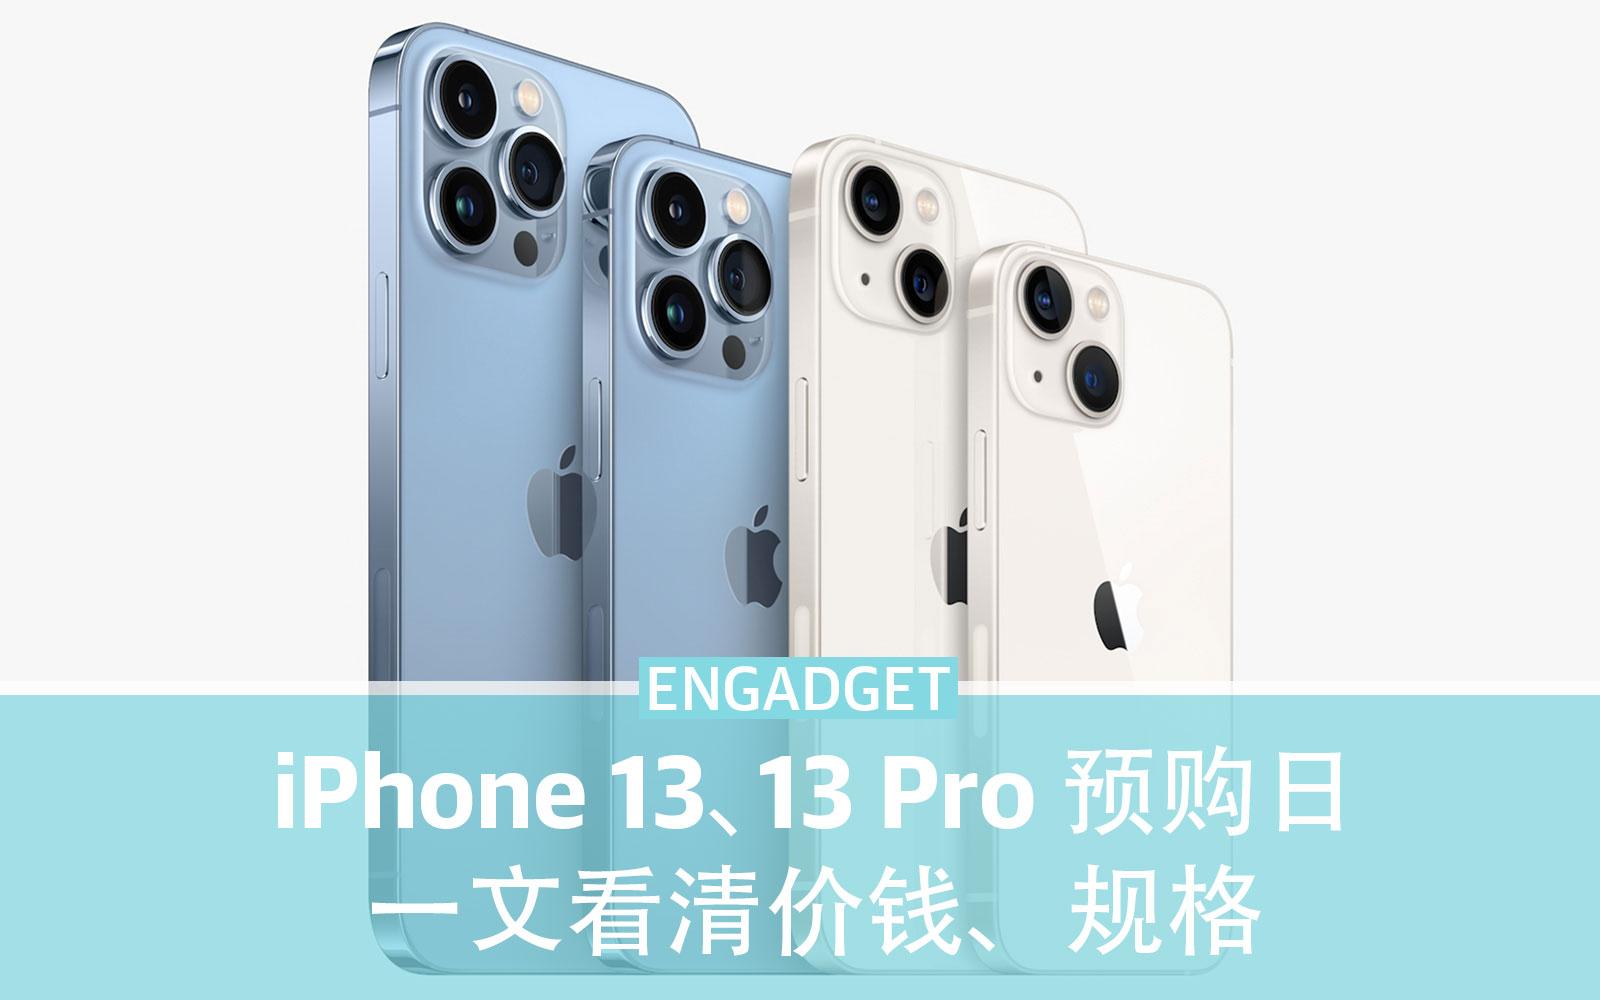 Apple iPhone 13 preorder cn